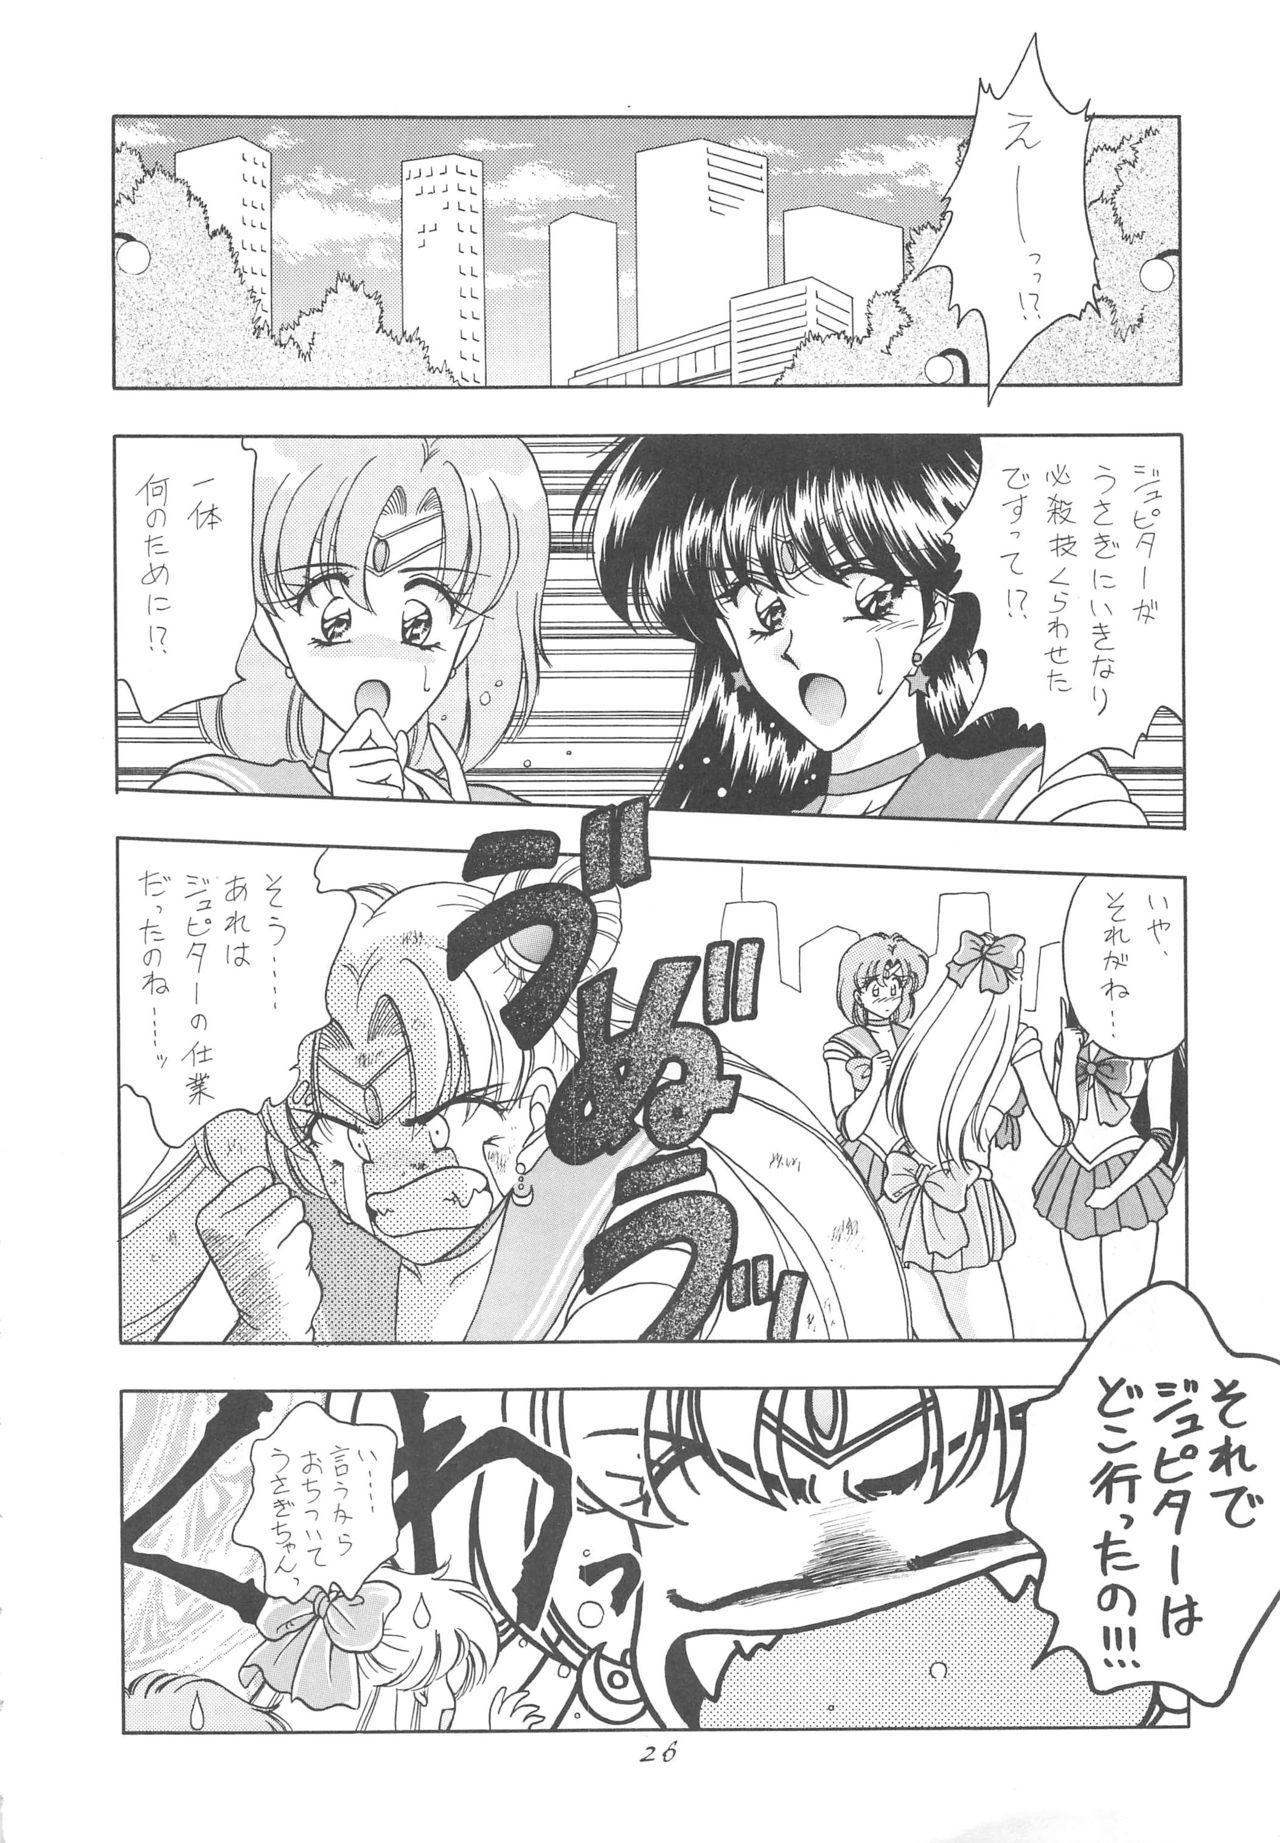 INDIVIDUAL 3 - 19930816 → 25